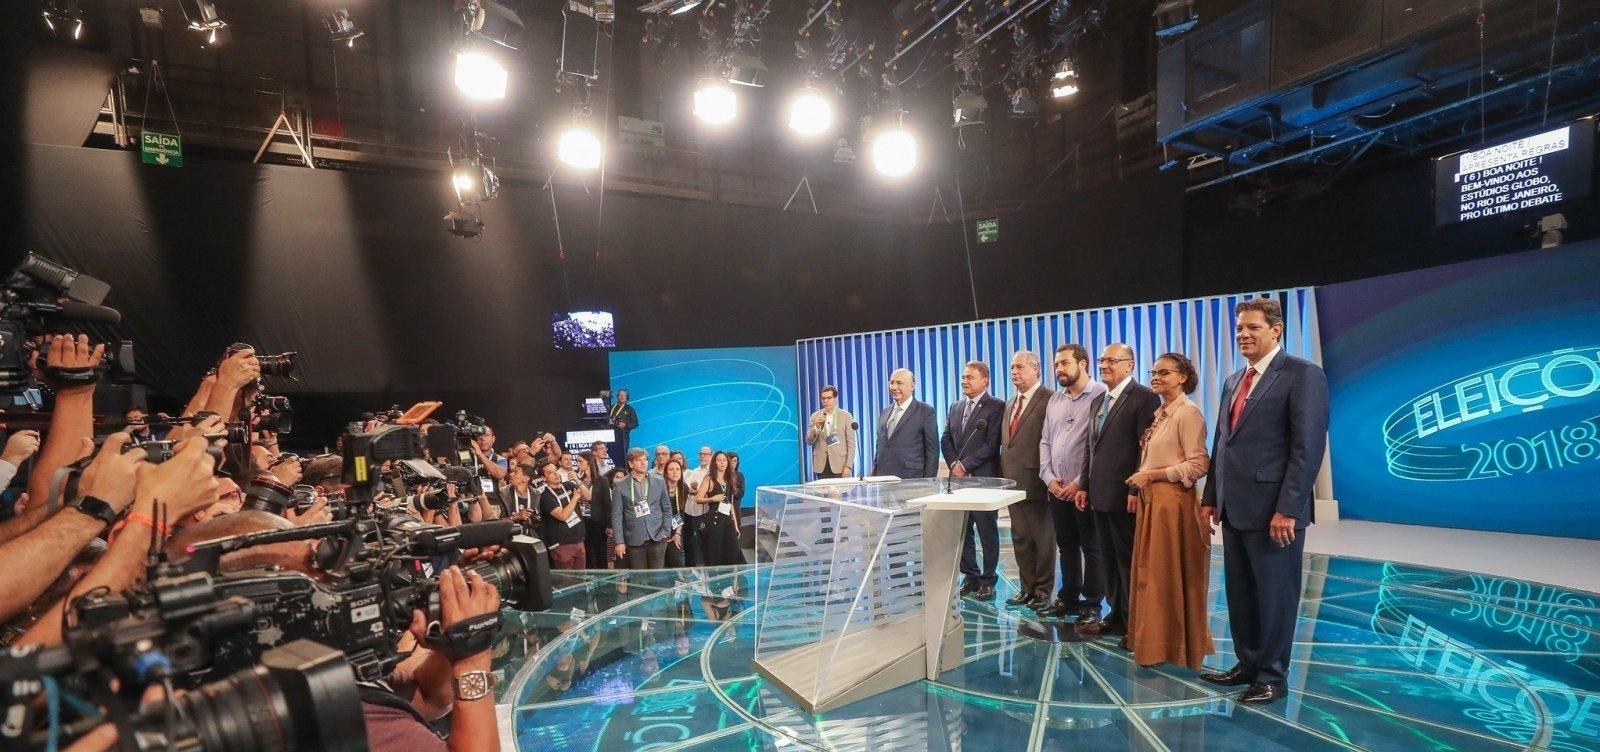 Partidos de presidenciáveis definem apoios para o segundo turno nesta semana